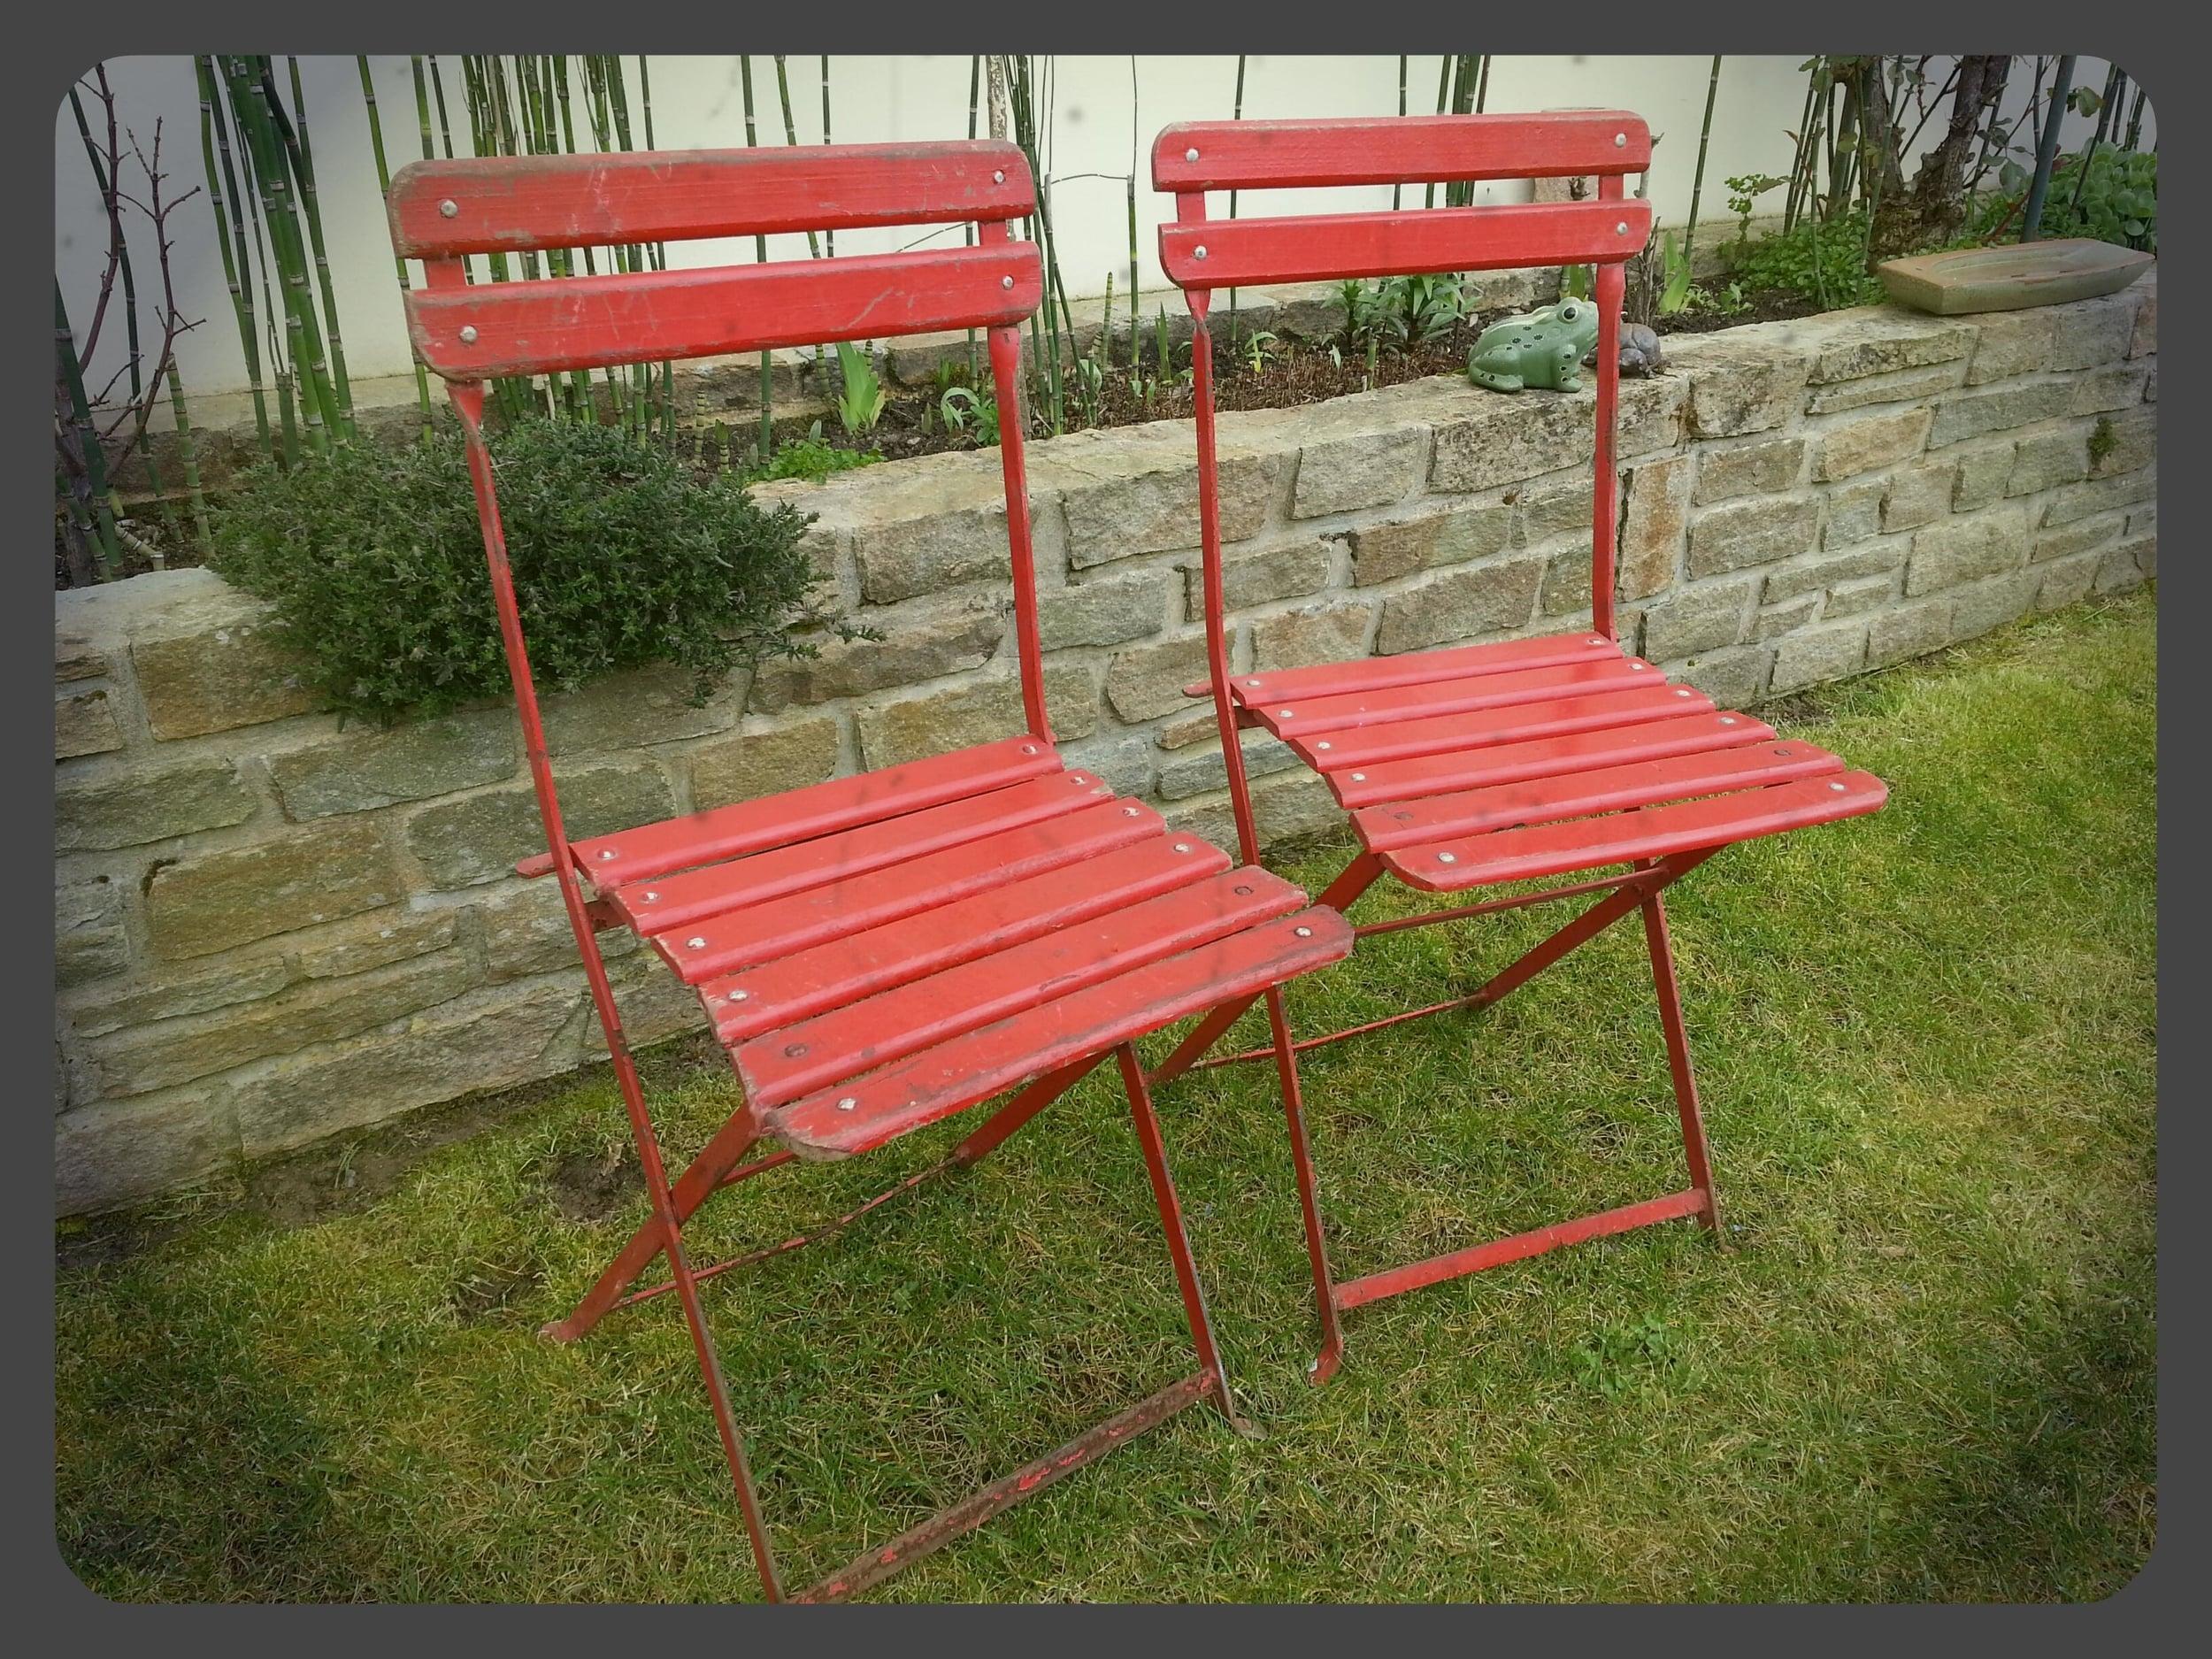 2 røde hagestoler klappstoler